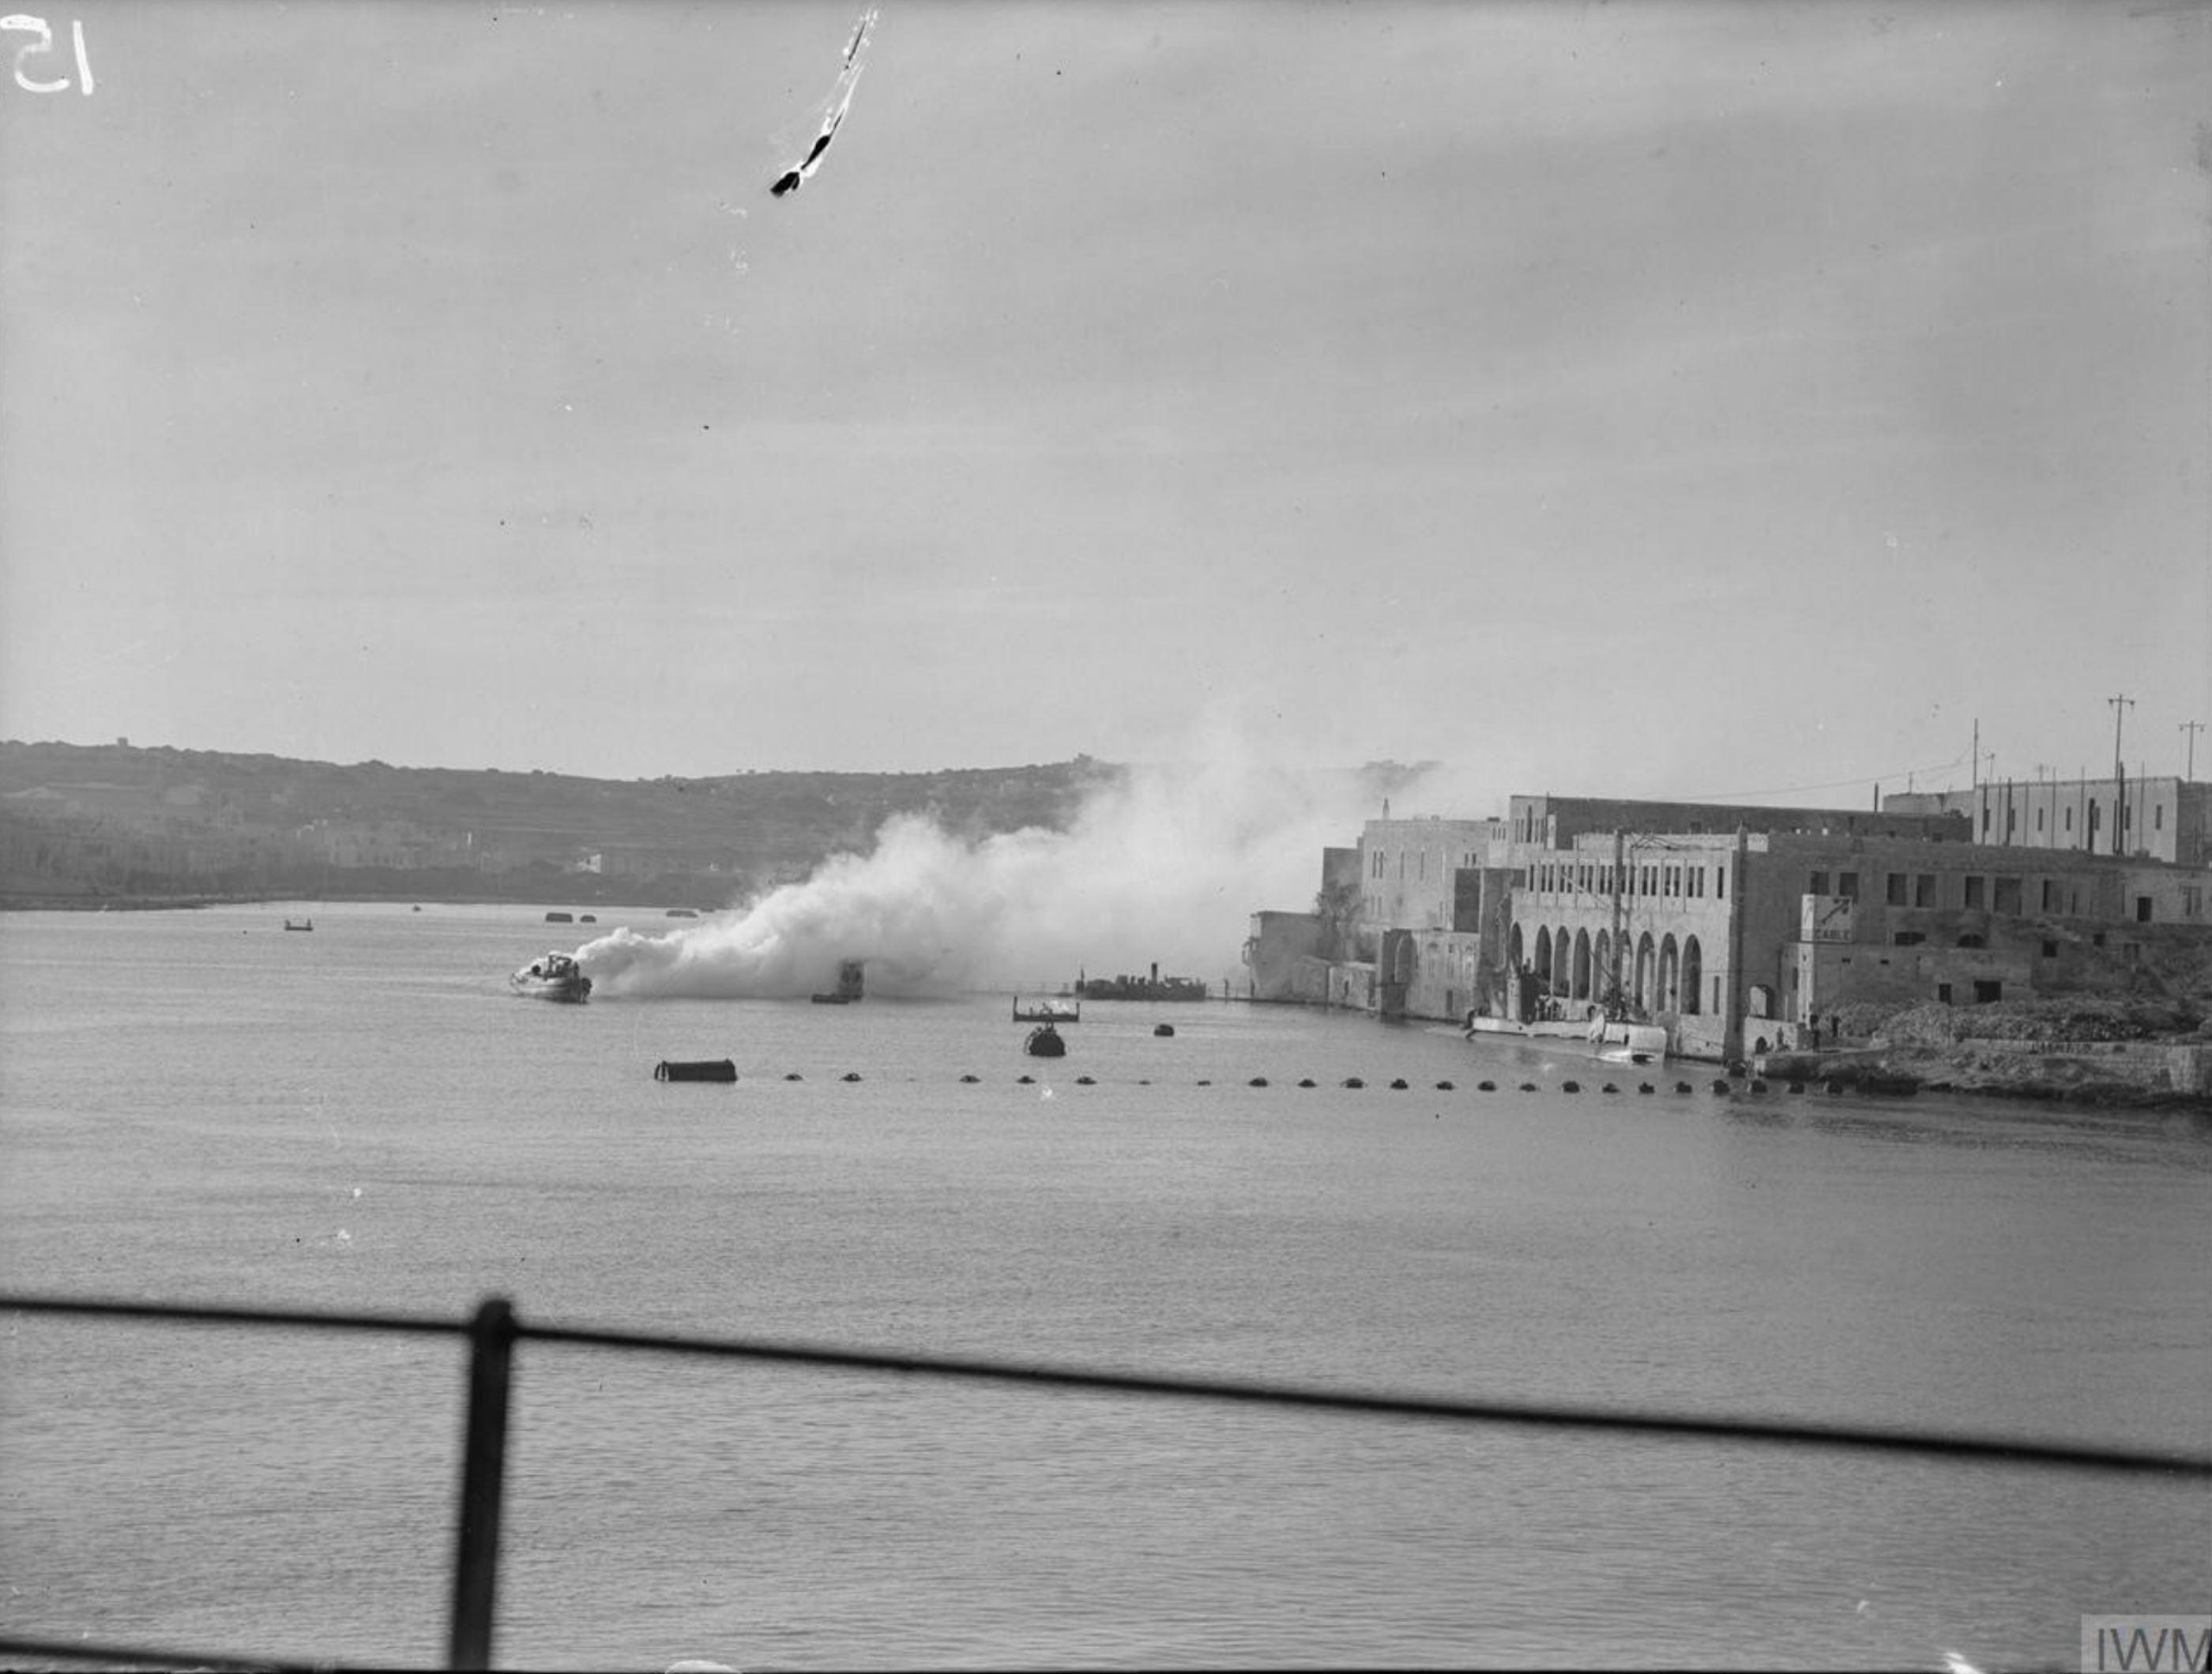 Harbour craft making a smoke screen at HMS Talbot the Royal Naval Submarine Base at Malta IWM A14392